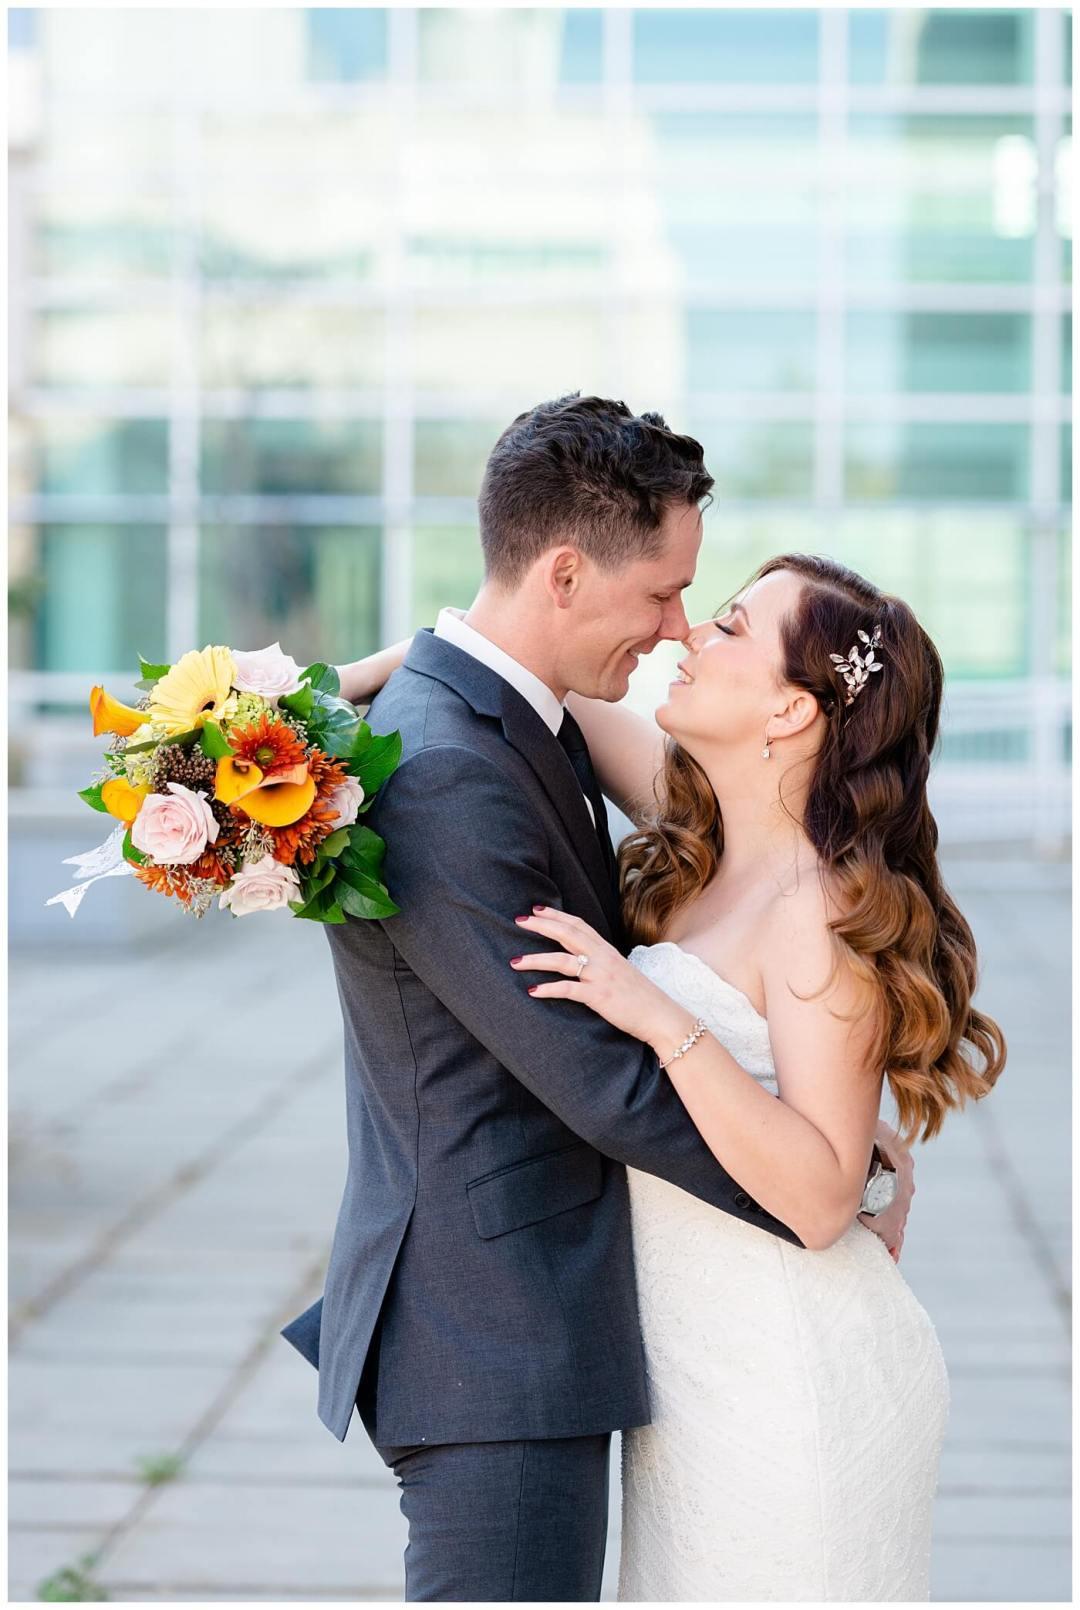 Regina Wedding Photographer - Tim & Jennelle At Home Wedding - Tim & Jennelle Giggle kiss